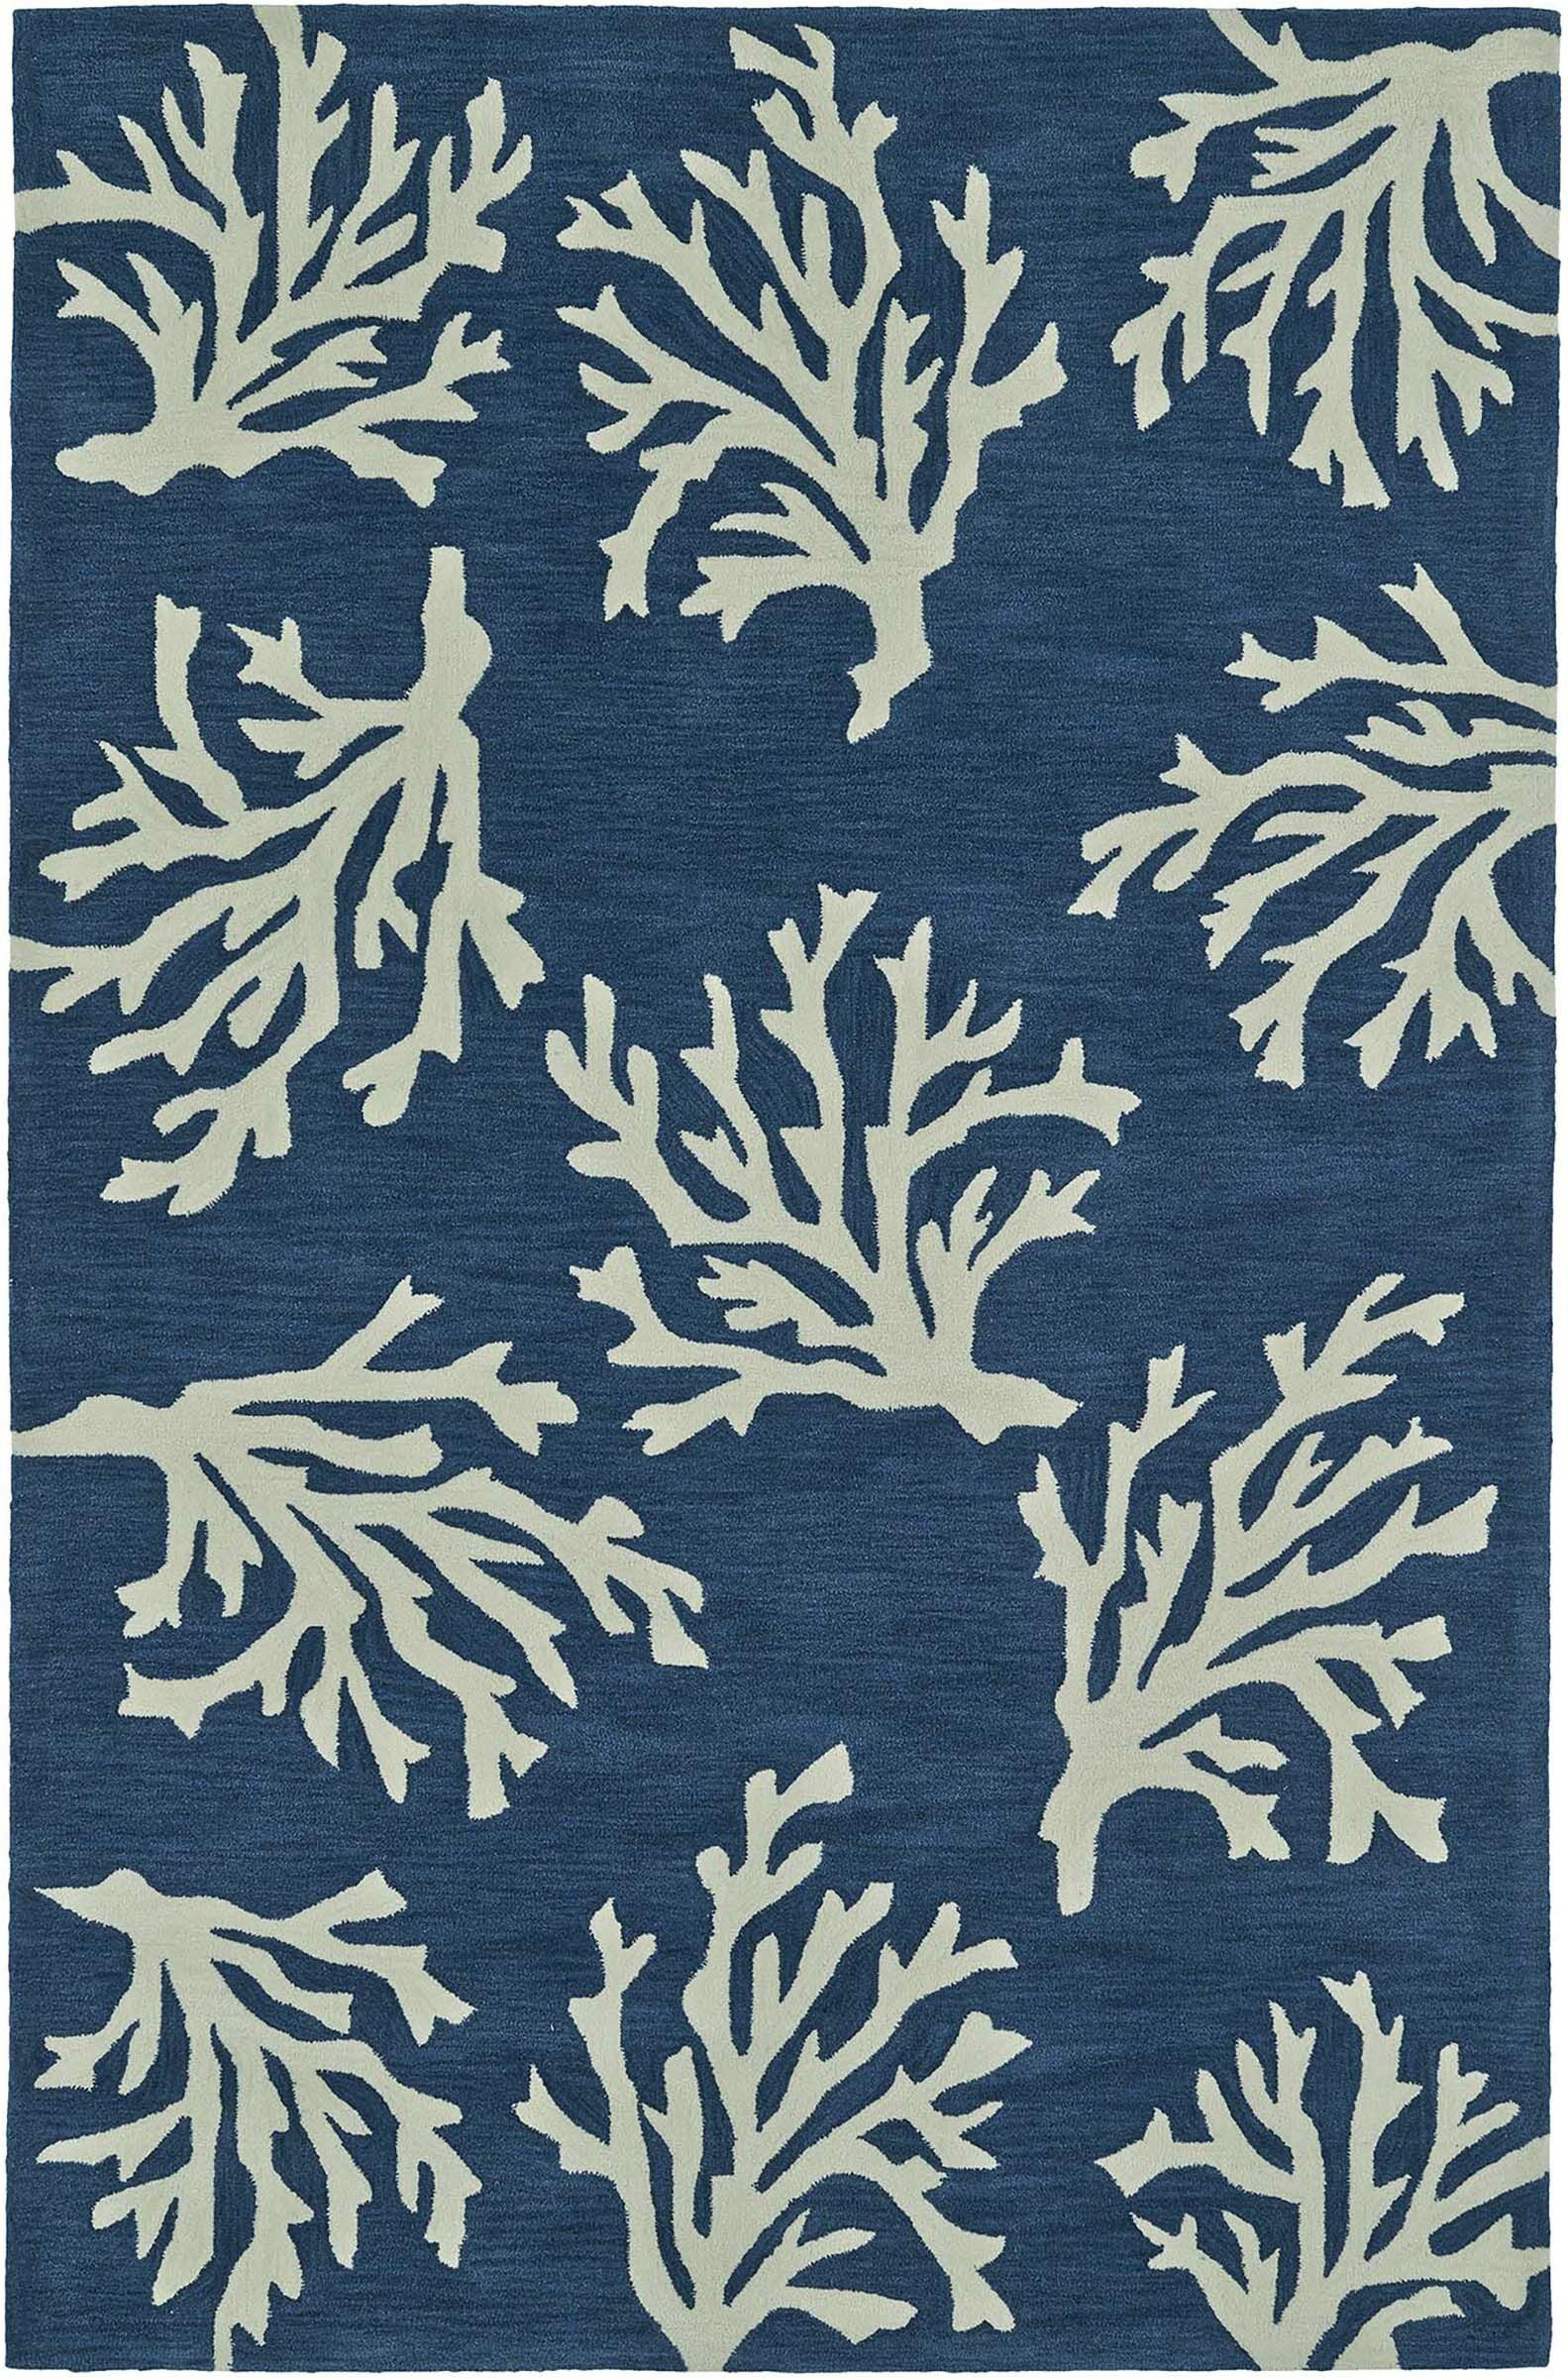 Bovina Hand-Tufted Blue/Ivory Area Rug Rug Size: Rectangle 8' x 10'